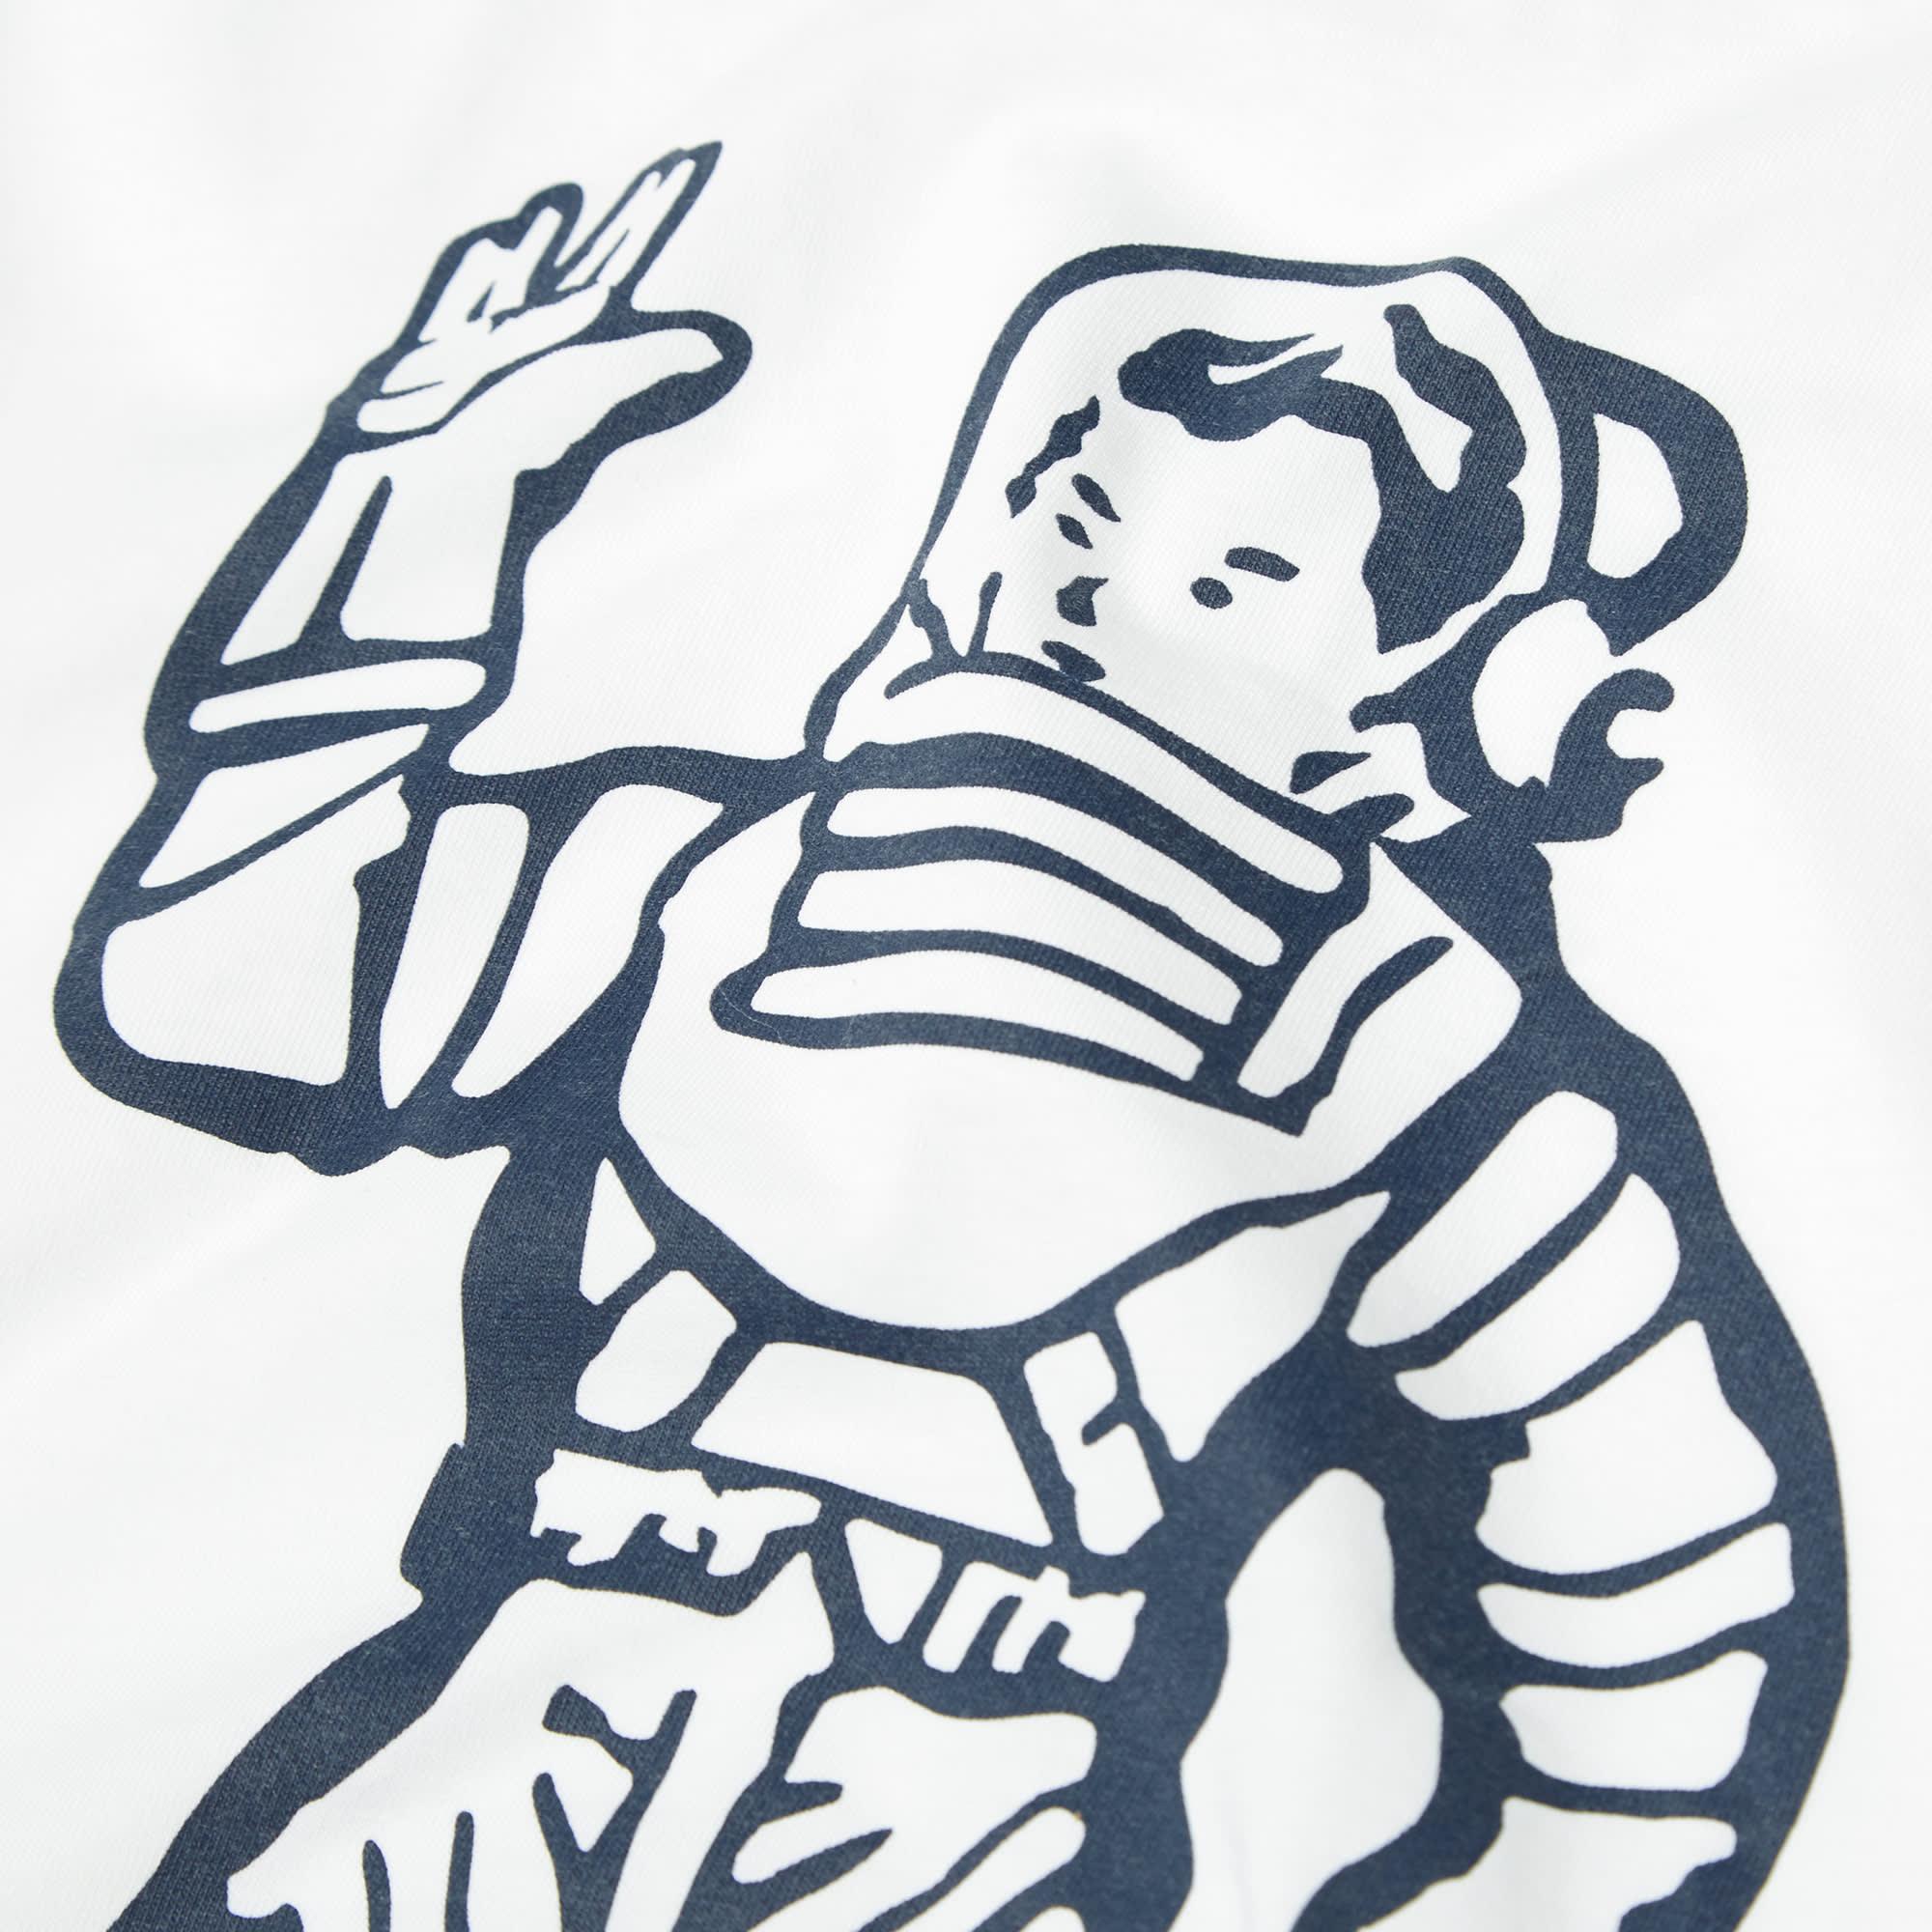 billionaire boys club astronaut logo - photo #15